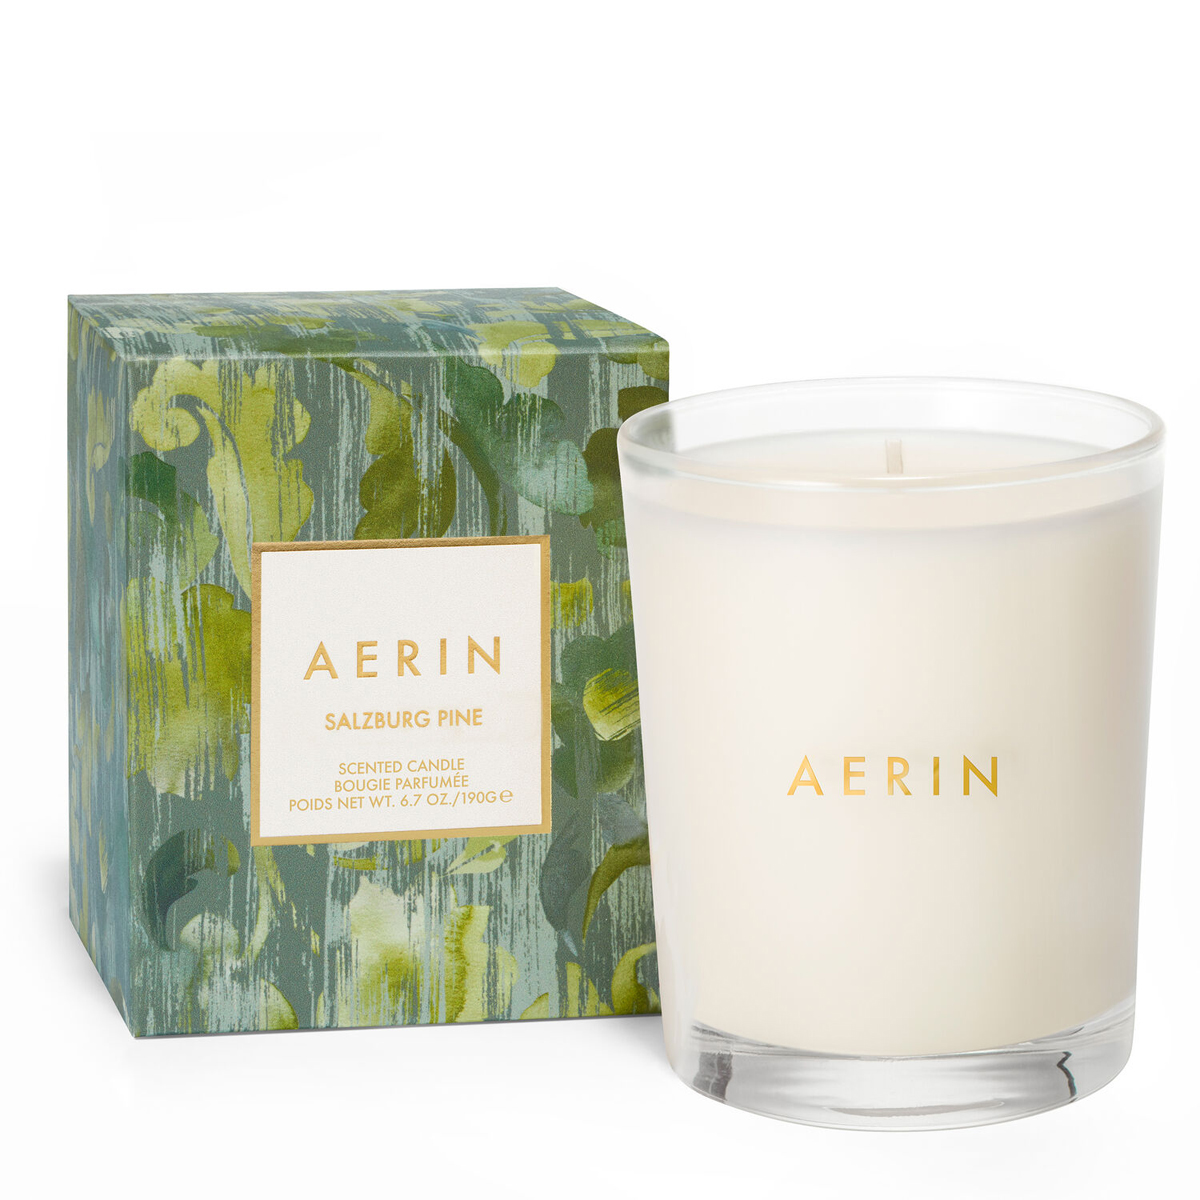 Aerin Salzburg Pine 6.7oz Candle